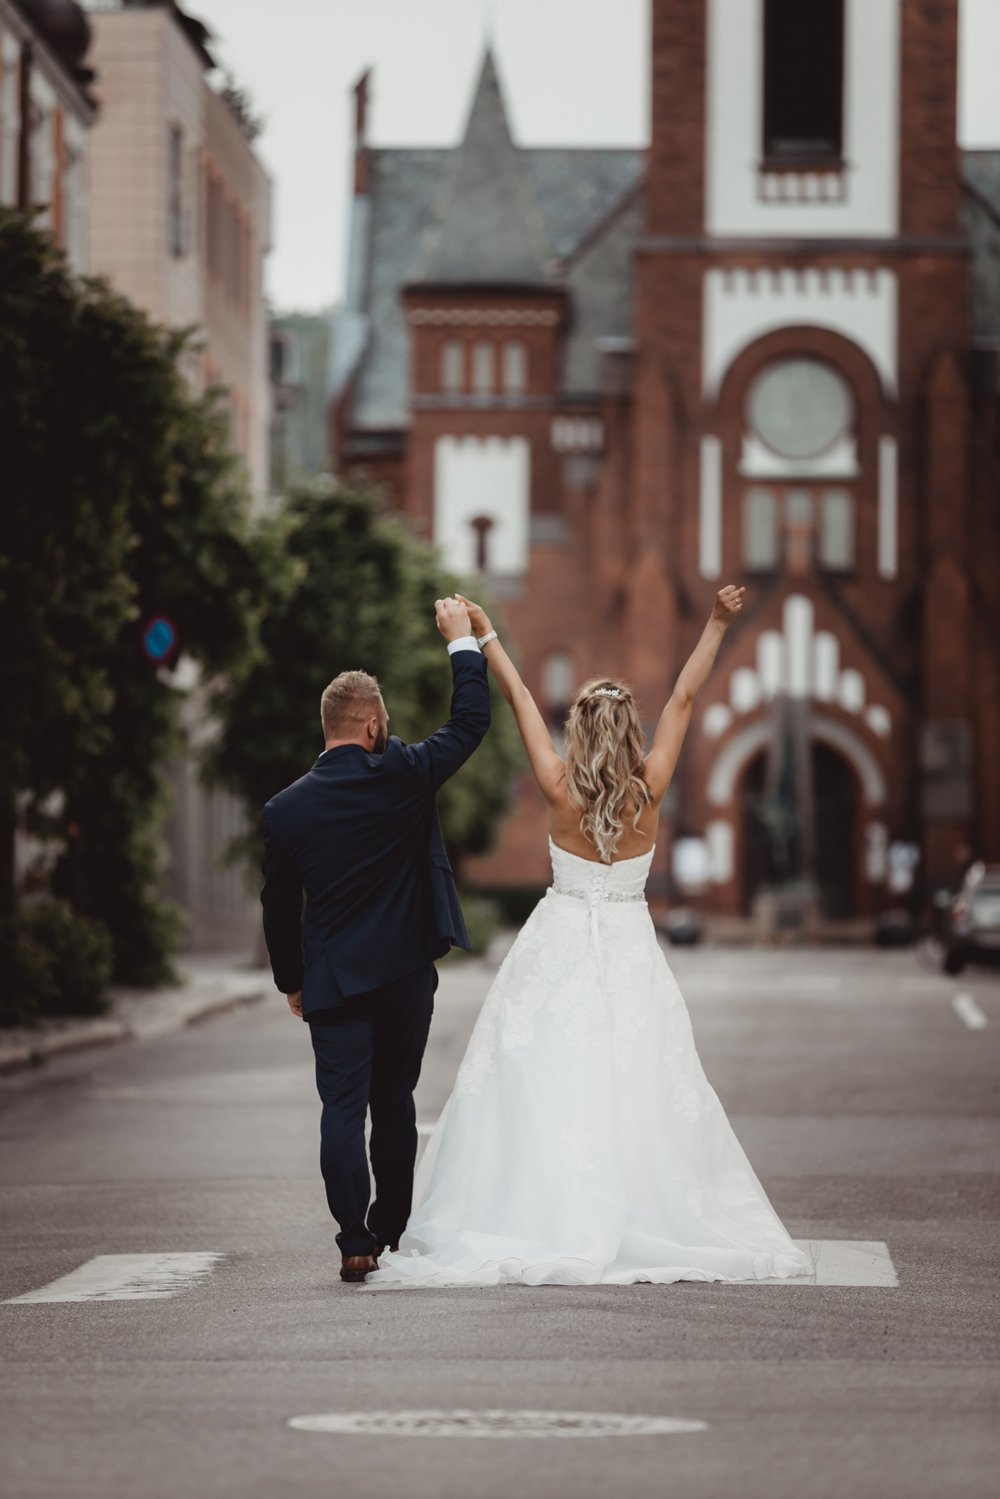 127_weddingphotographer_Bryllupsfotografering_Bryllupsbilder_fatmonkeyfoto_Bryllupsfotograf.jpg